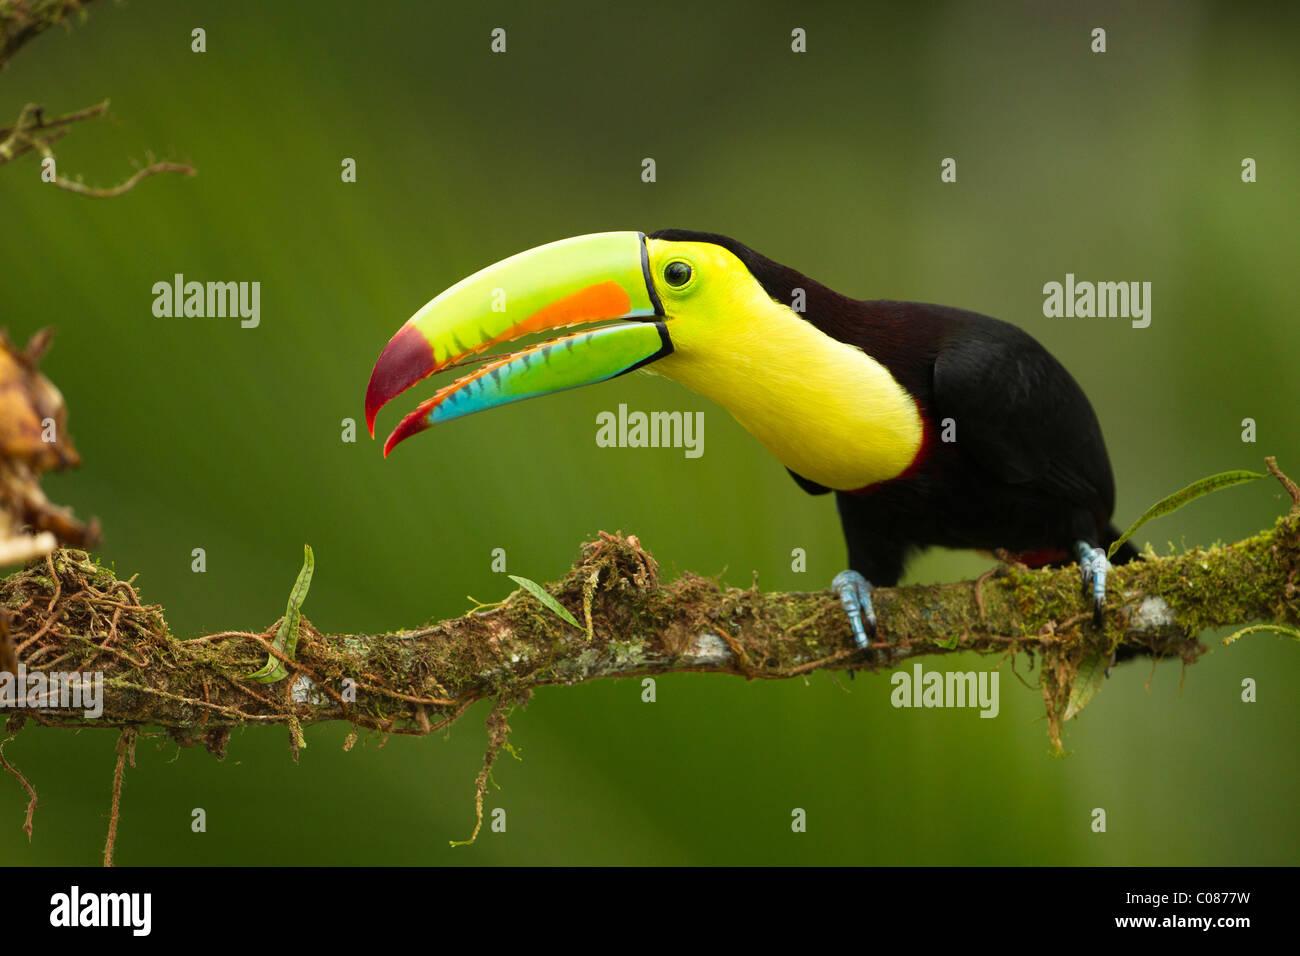 Keel-billed toucan, in full breeding plumage, Laguana del Lagarto, Costa Rica - Stock Image